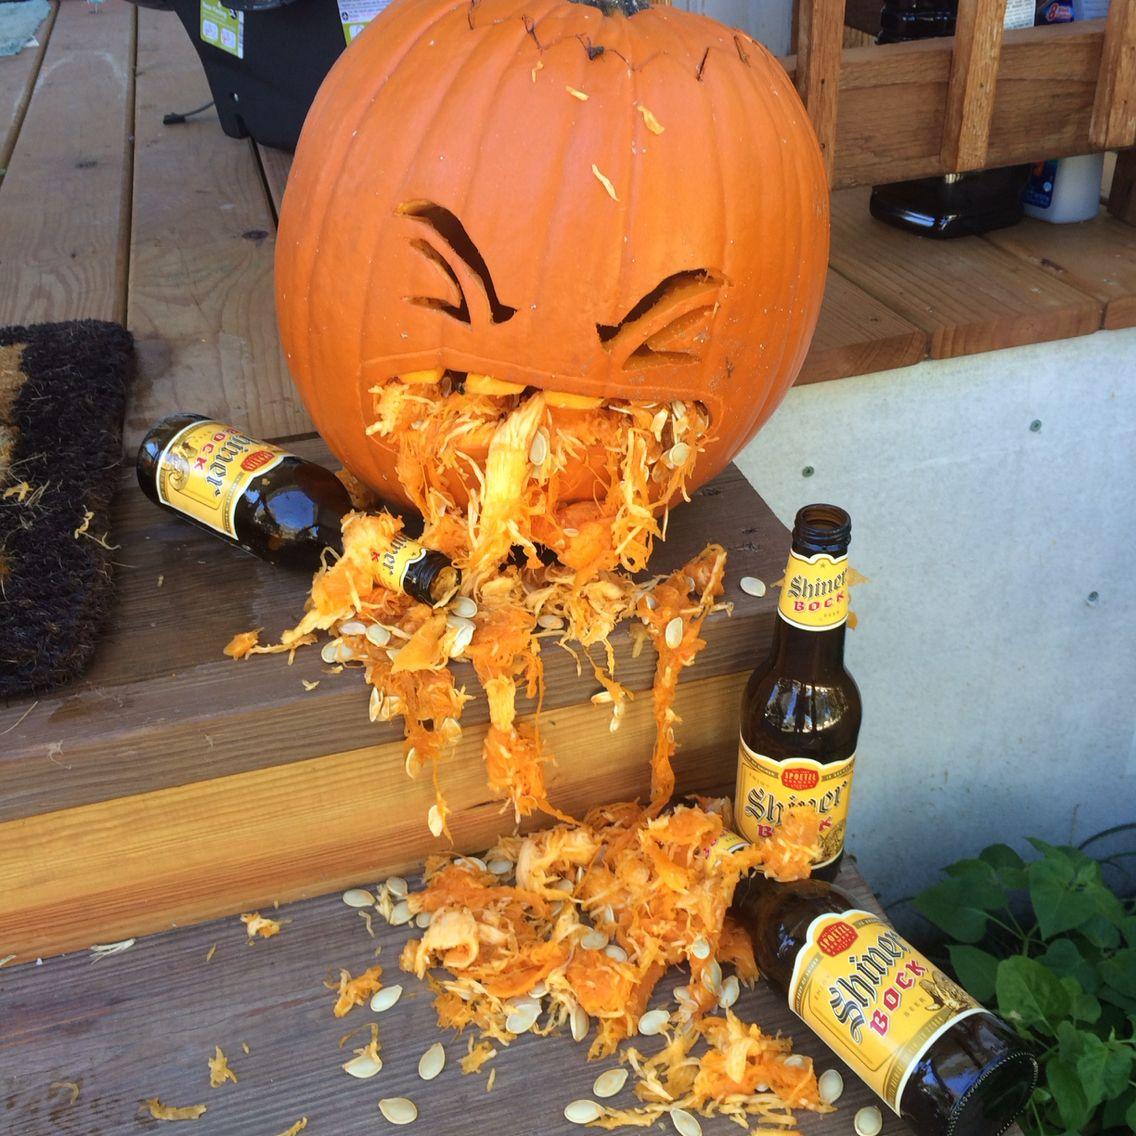 puking drunk pumpkin halloween pumpkin drunk on shiner bock halloween decor pumpkin throwing up funny pumpkin - Funny Halloween Pumpkin Carvings